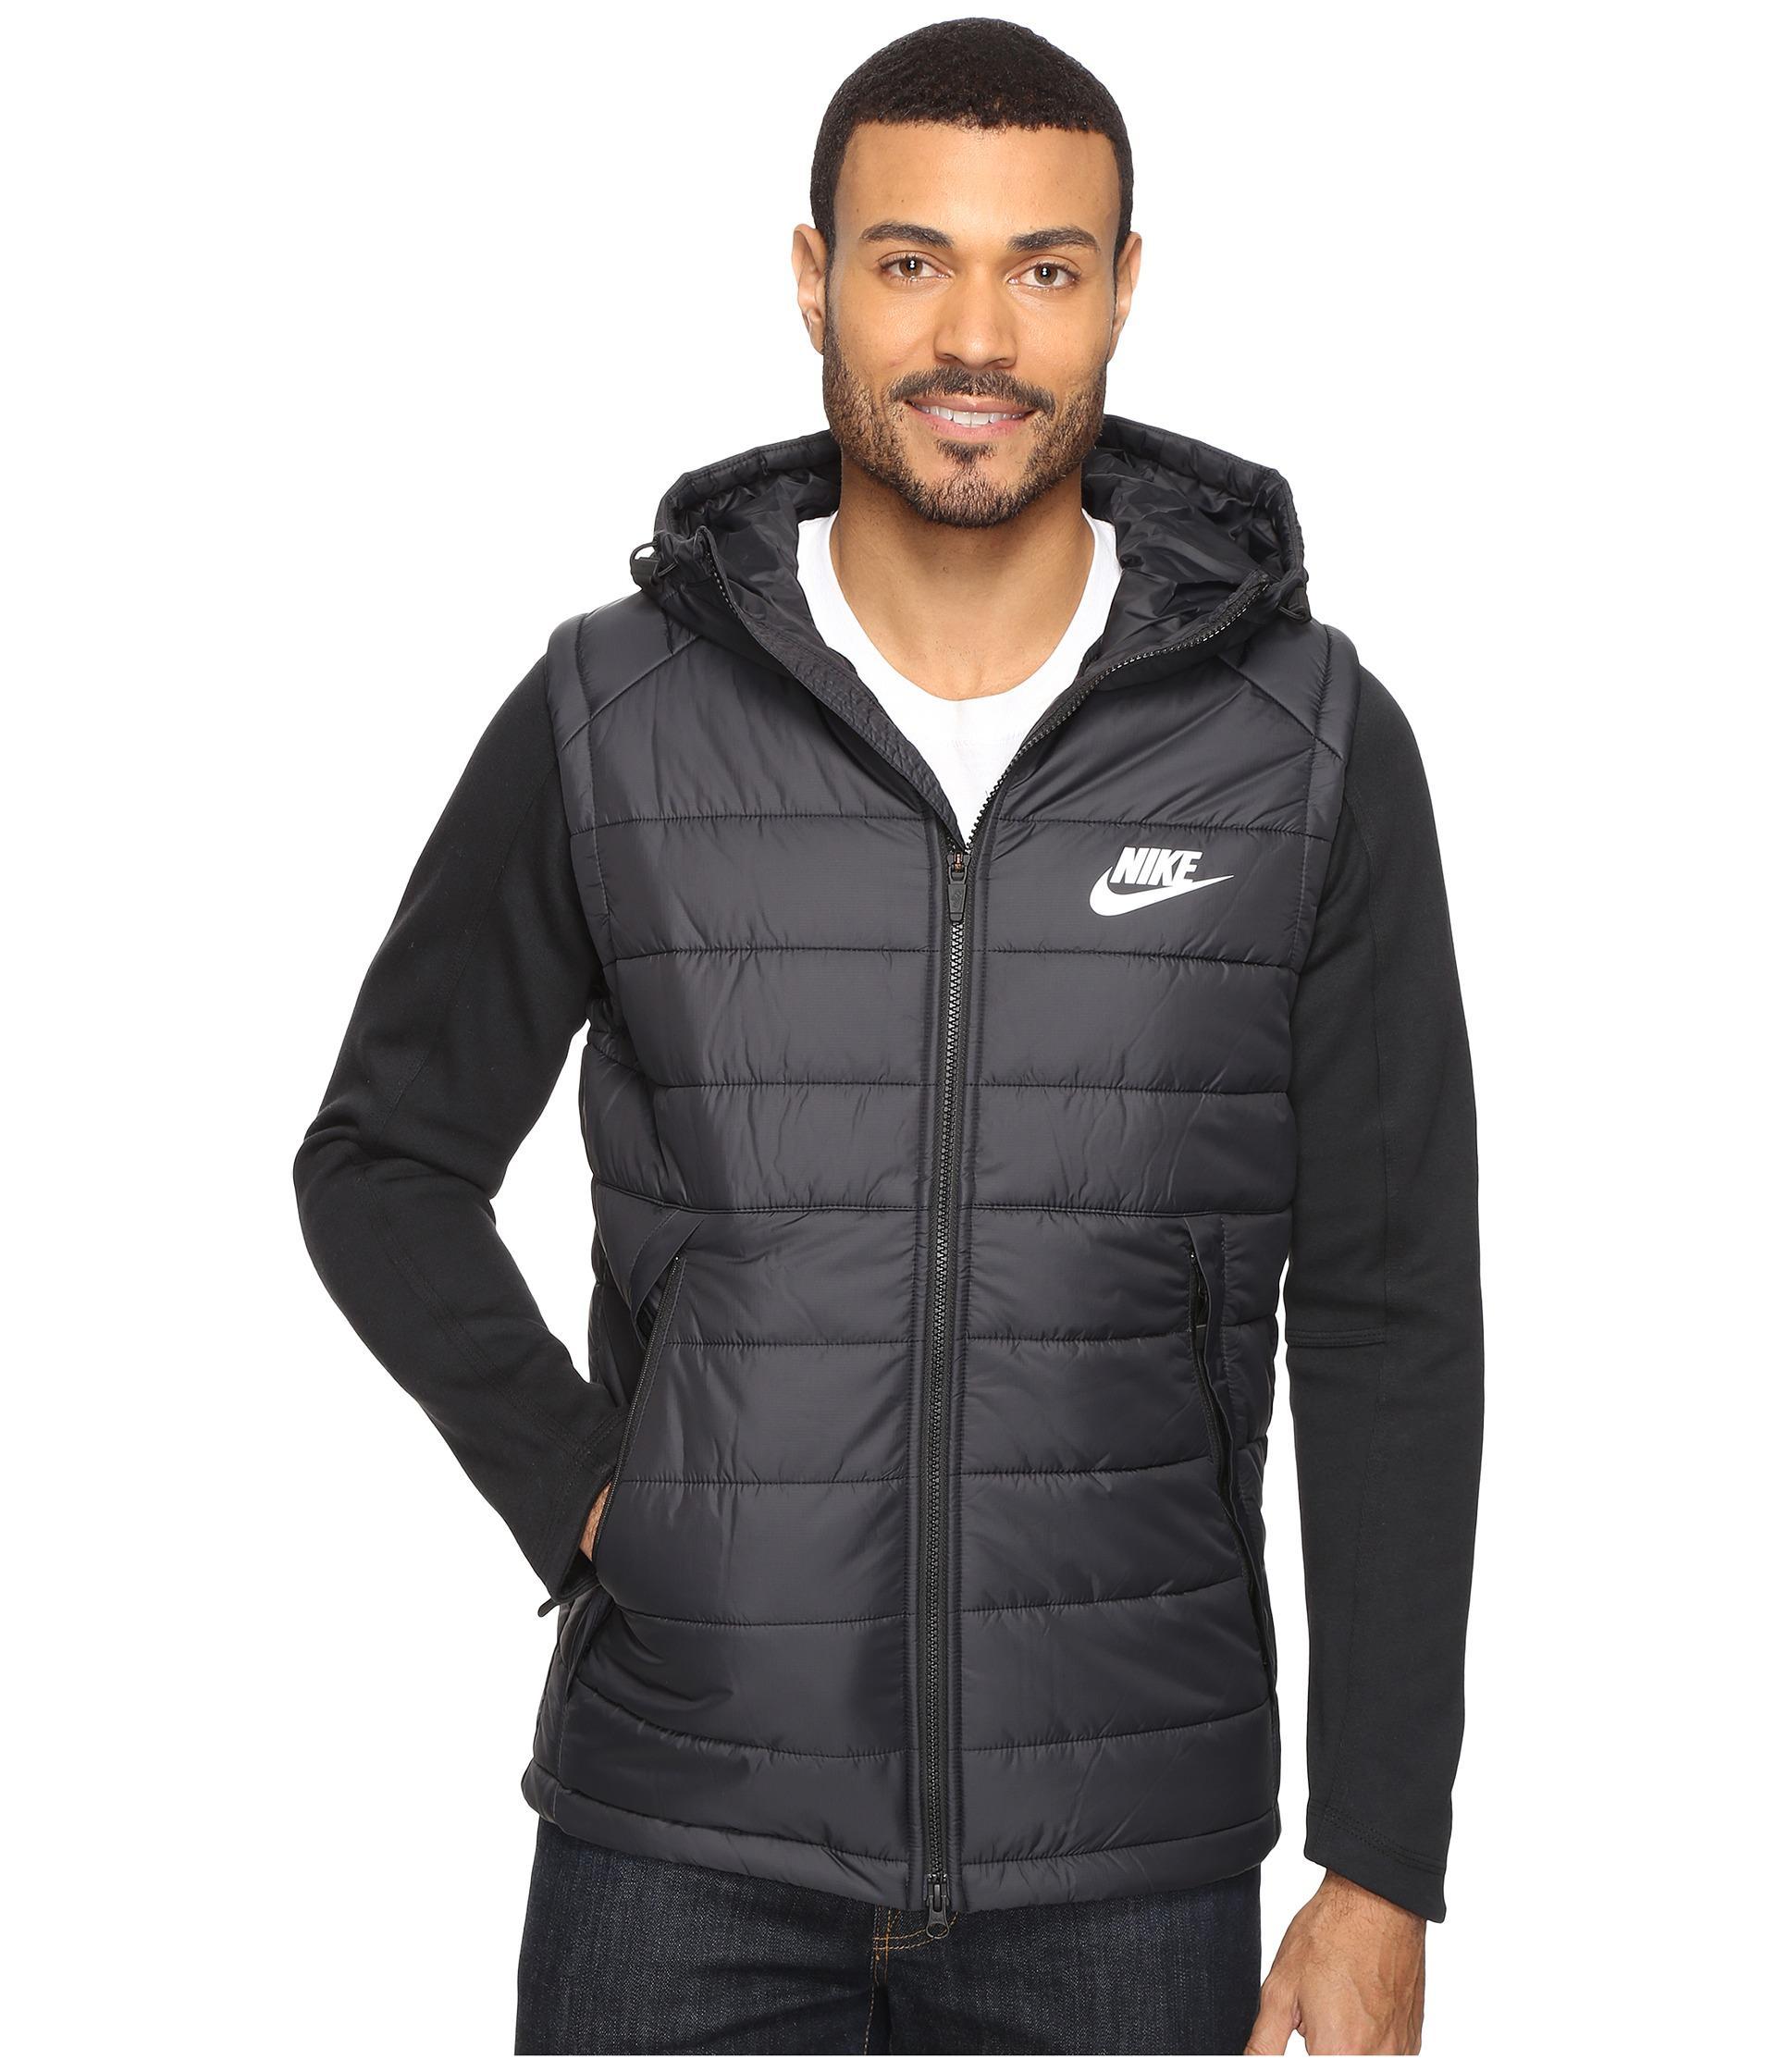 Nike epic jacket - Gallery